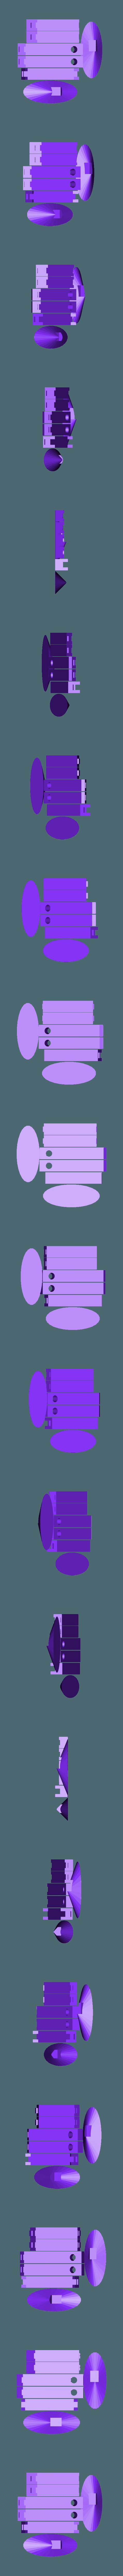 Ark of light Print in One Time.stl Download STL file The Ark of Light - Desk Lamp for Precision Work • 3D printer object, Eskice